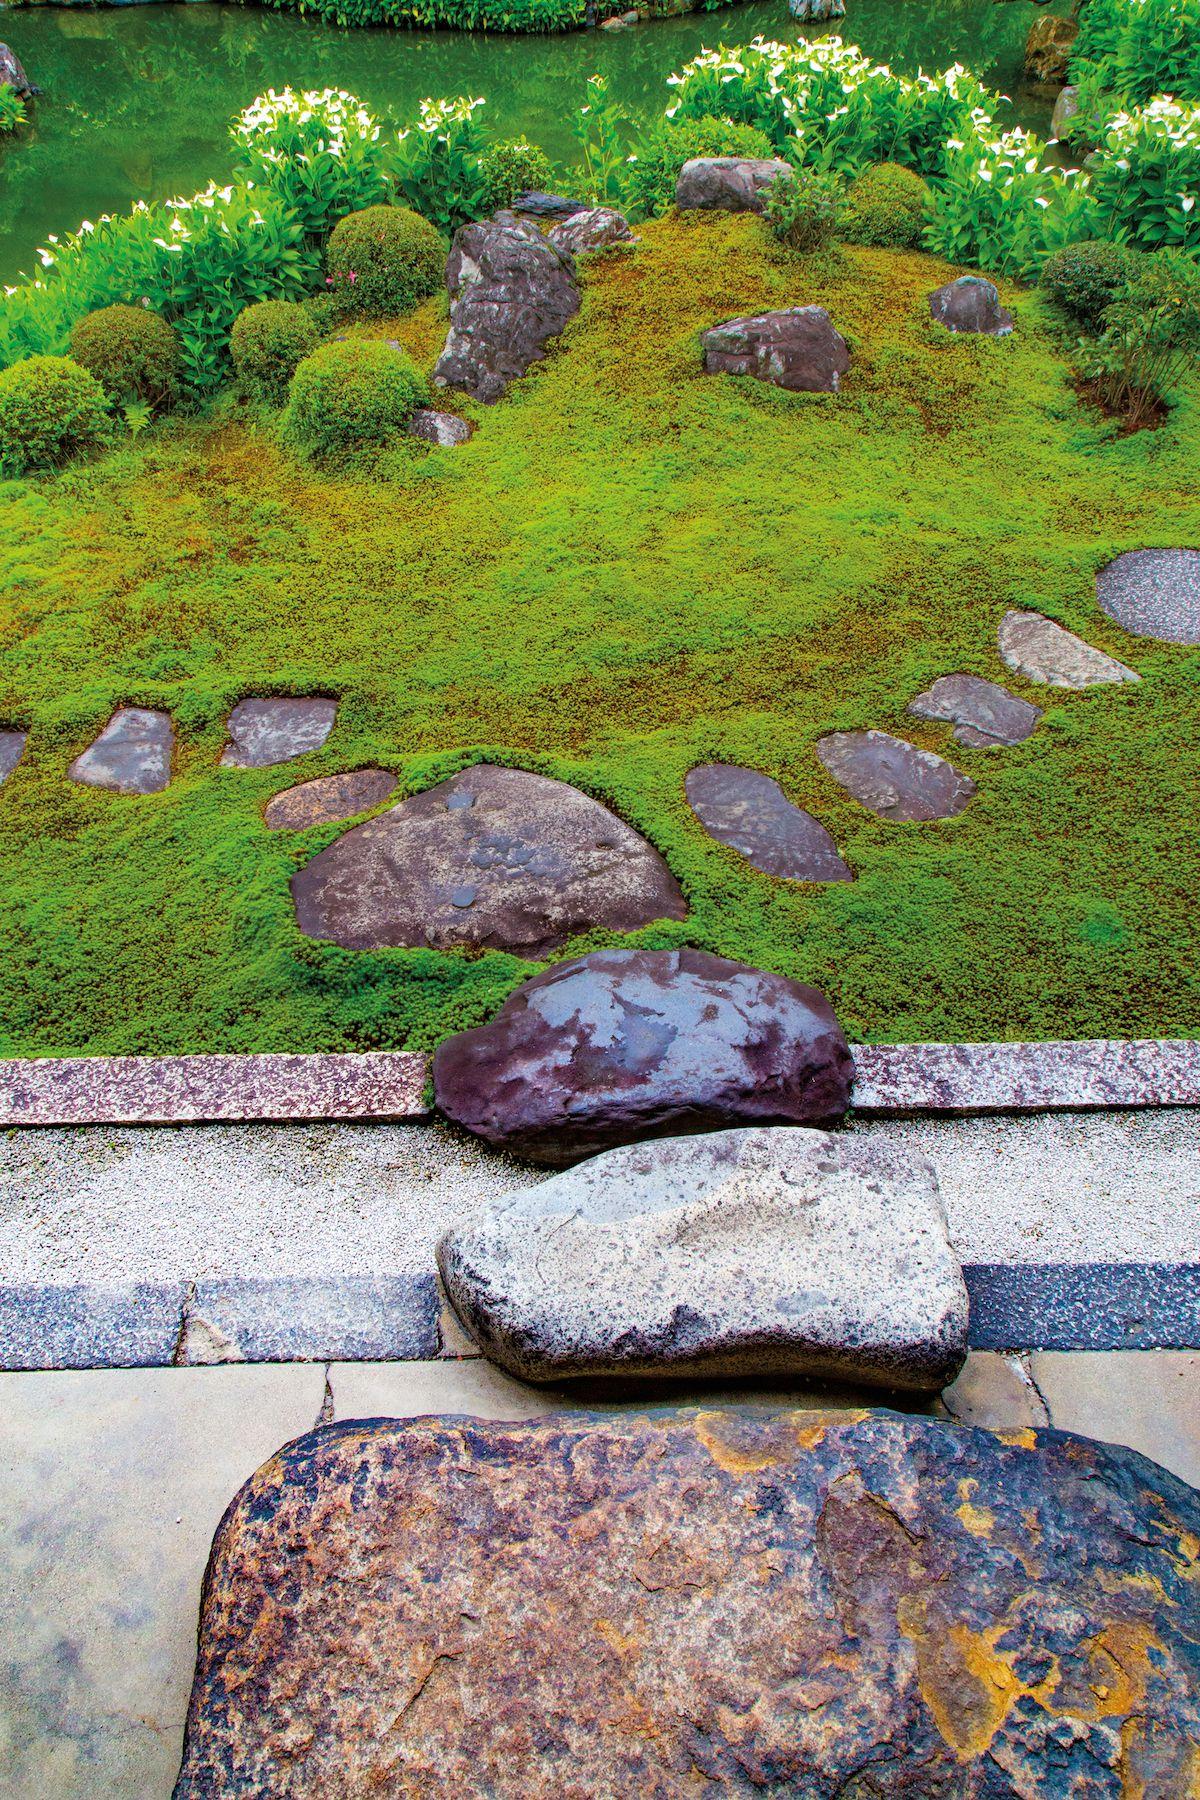 Stepping stone paths at Ryosokuin garden in Kyoto Japan